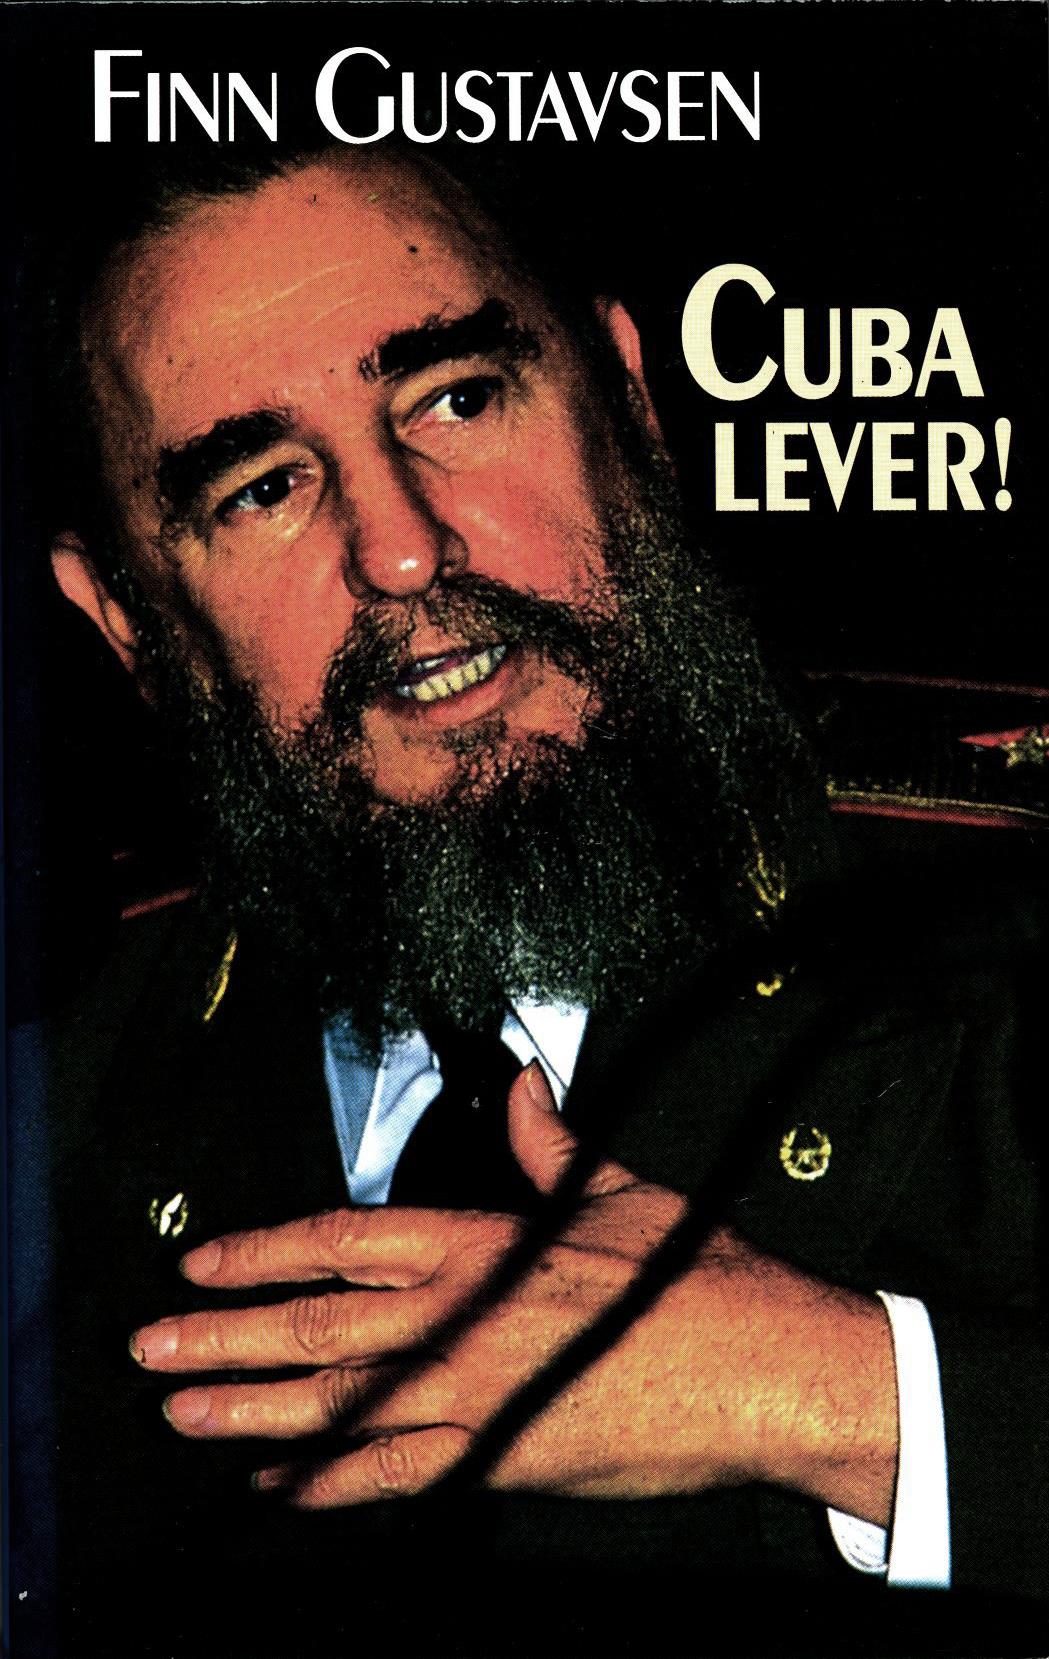 Finn Gustavsen: Cuba lever!